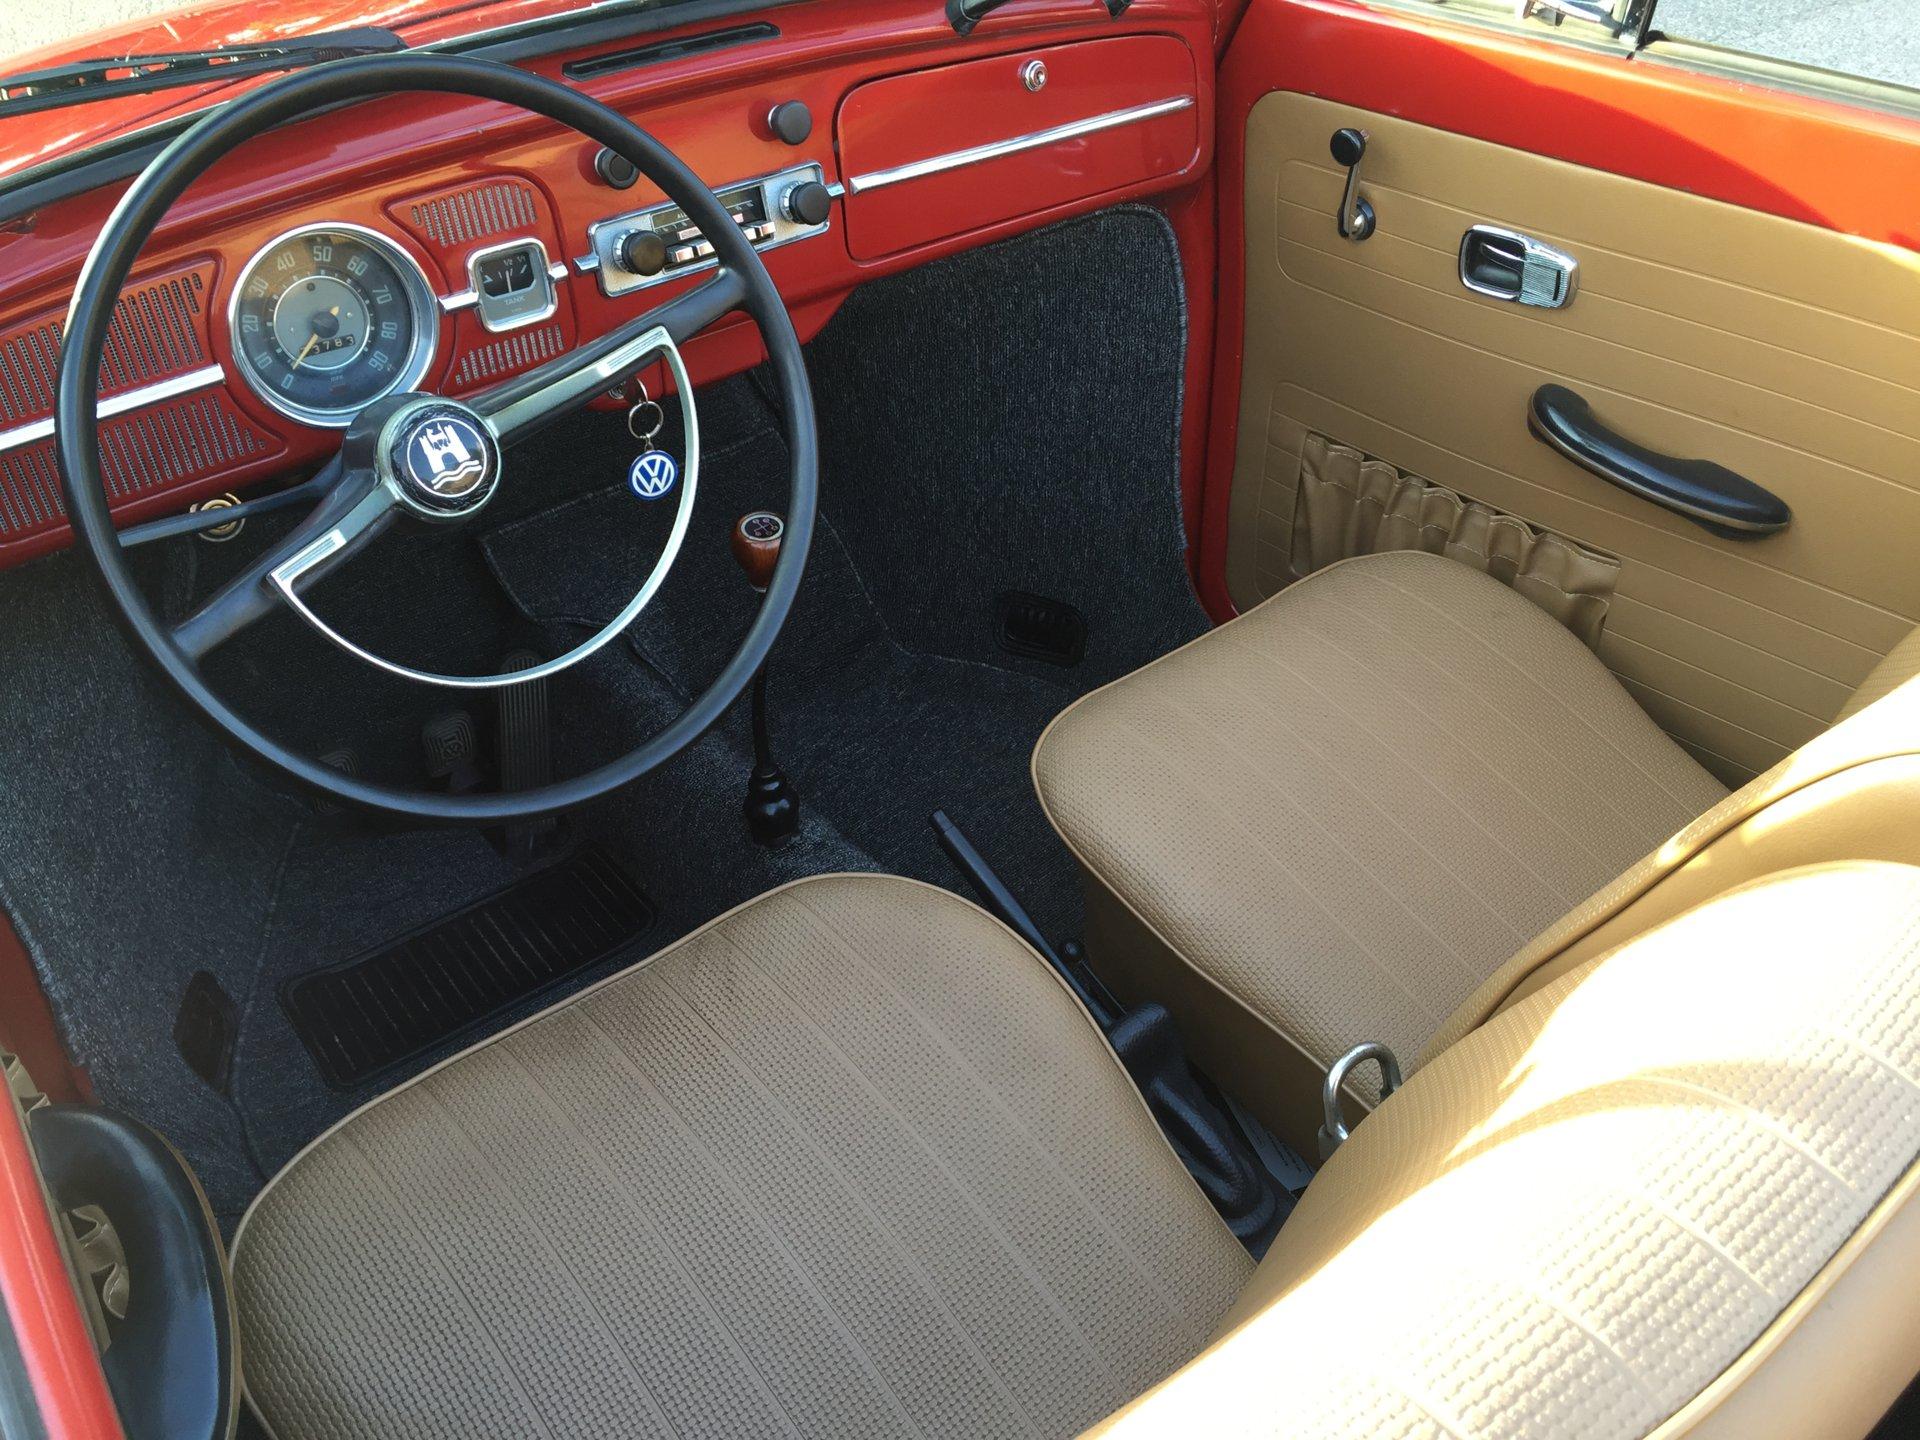 For Sale - 1967 VW Beetle Convertible, Hilton Head Island